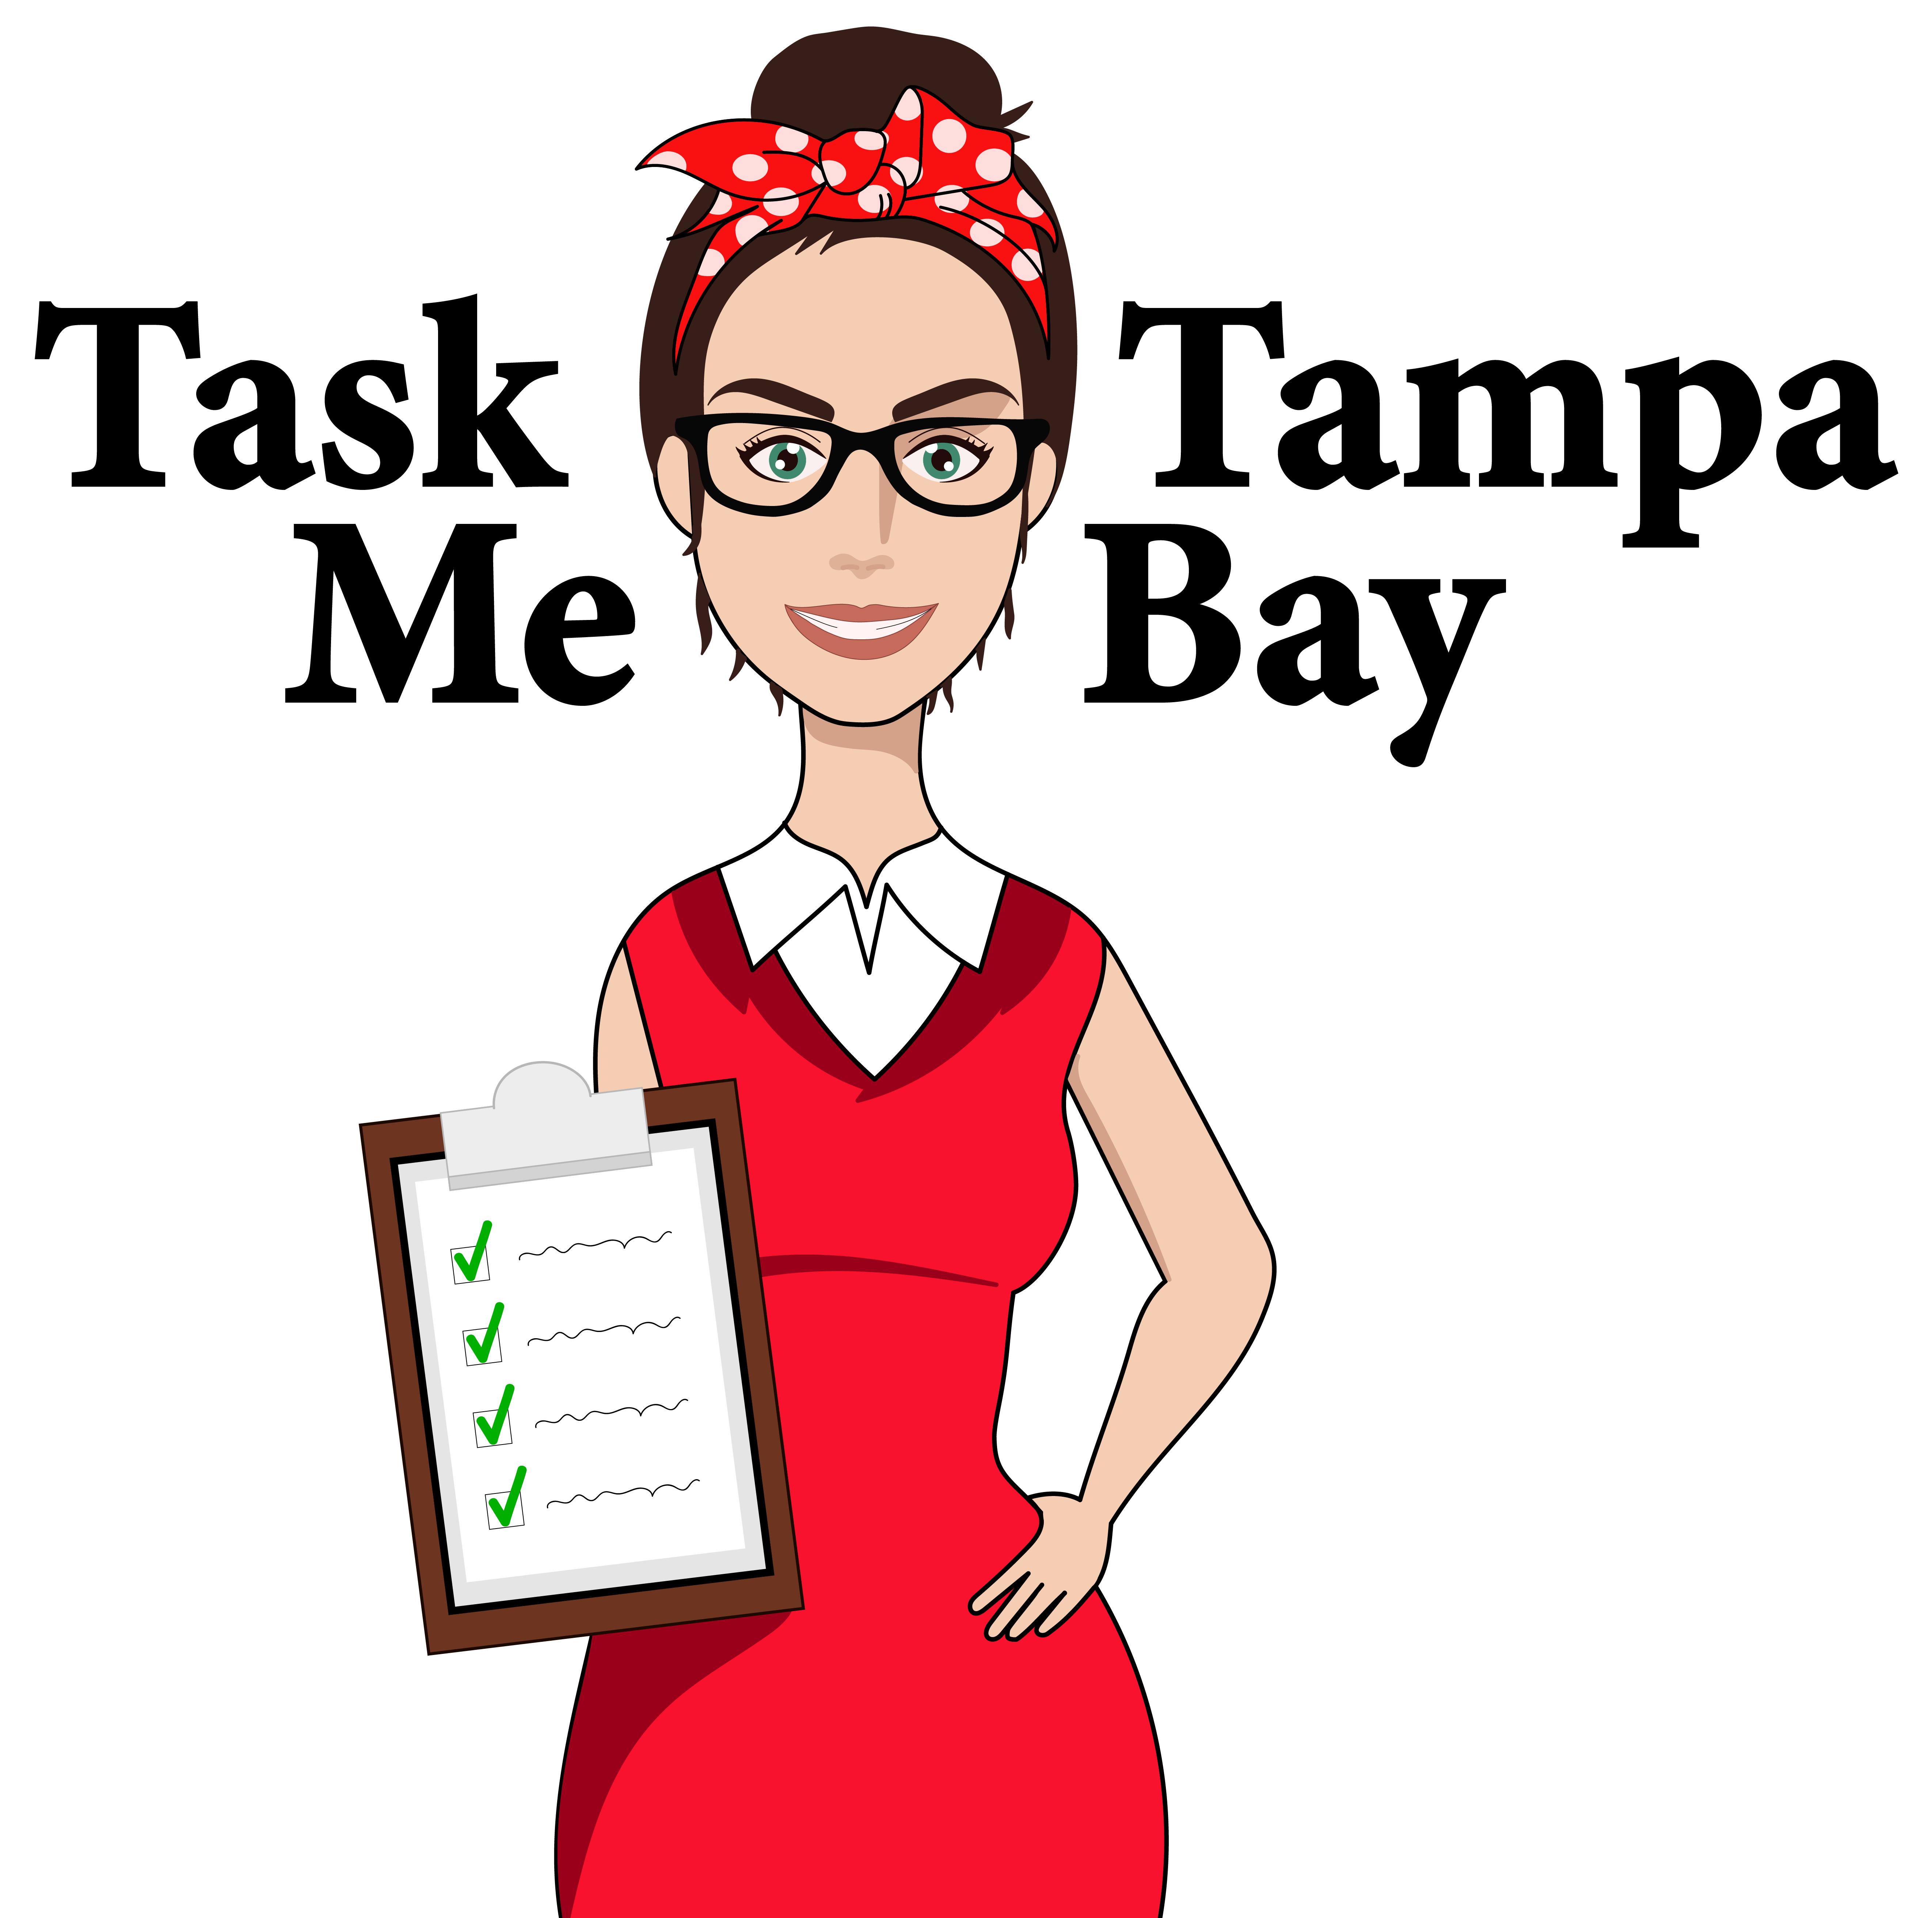 Task Me Tampa Bay